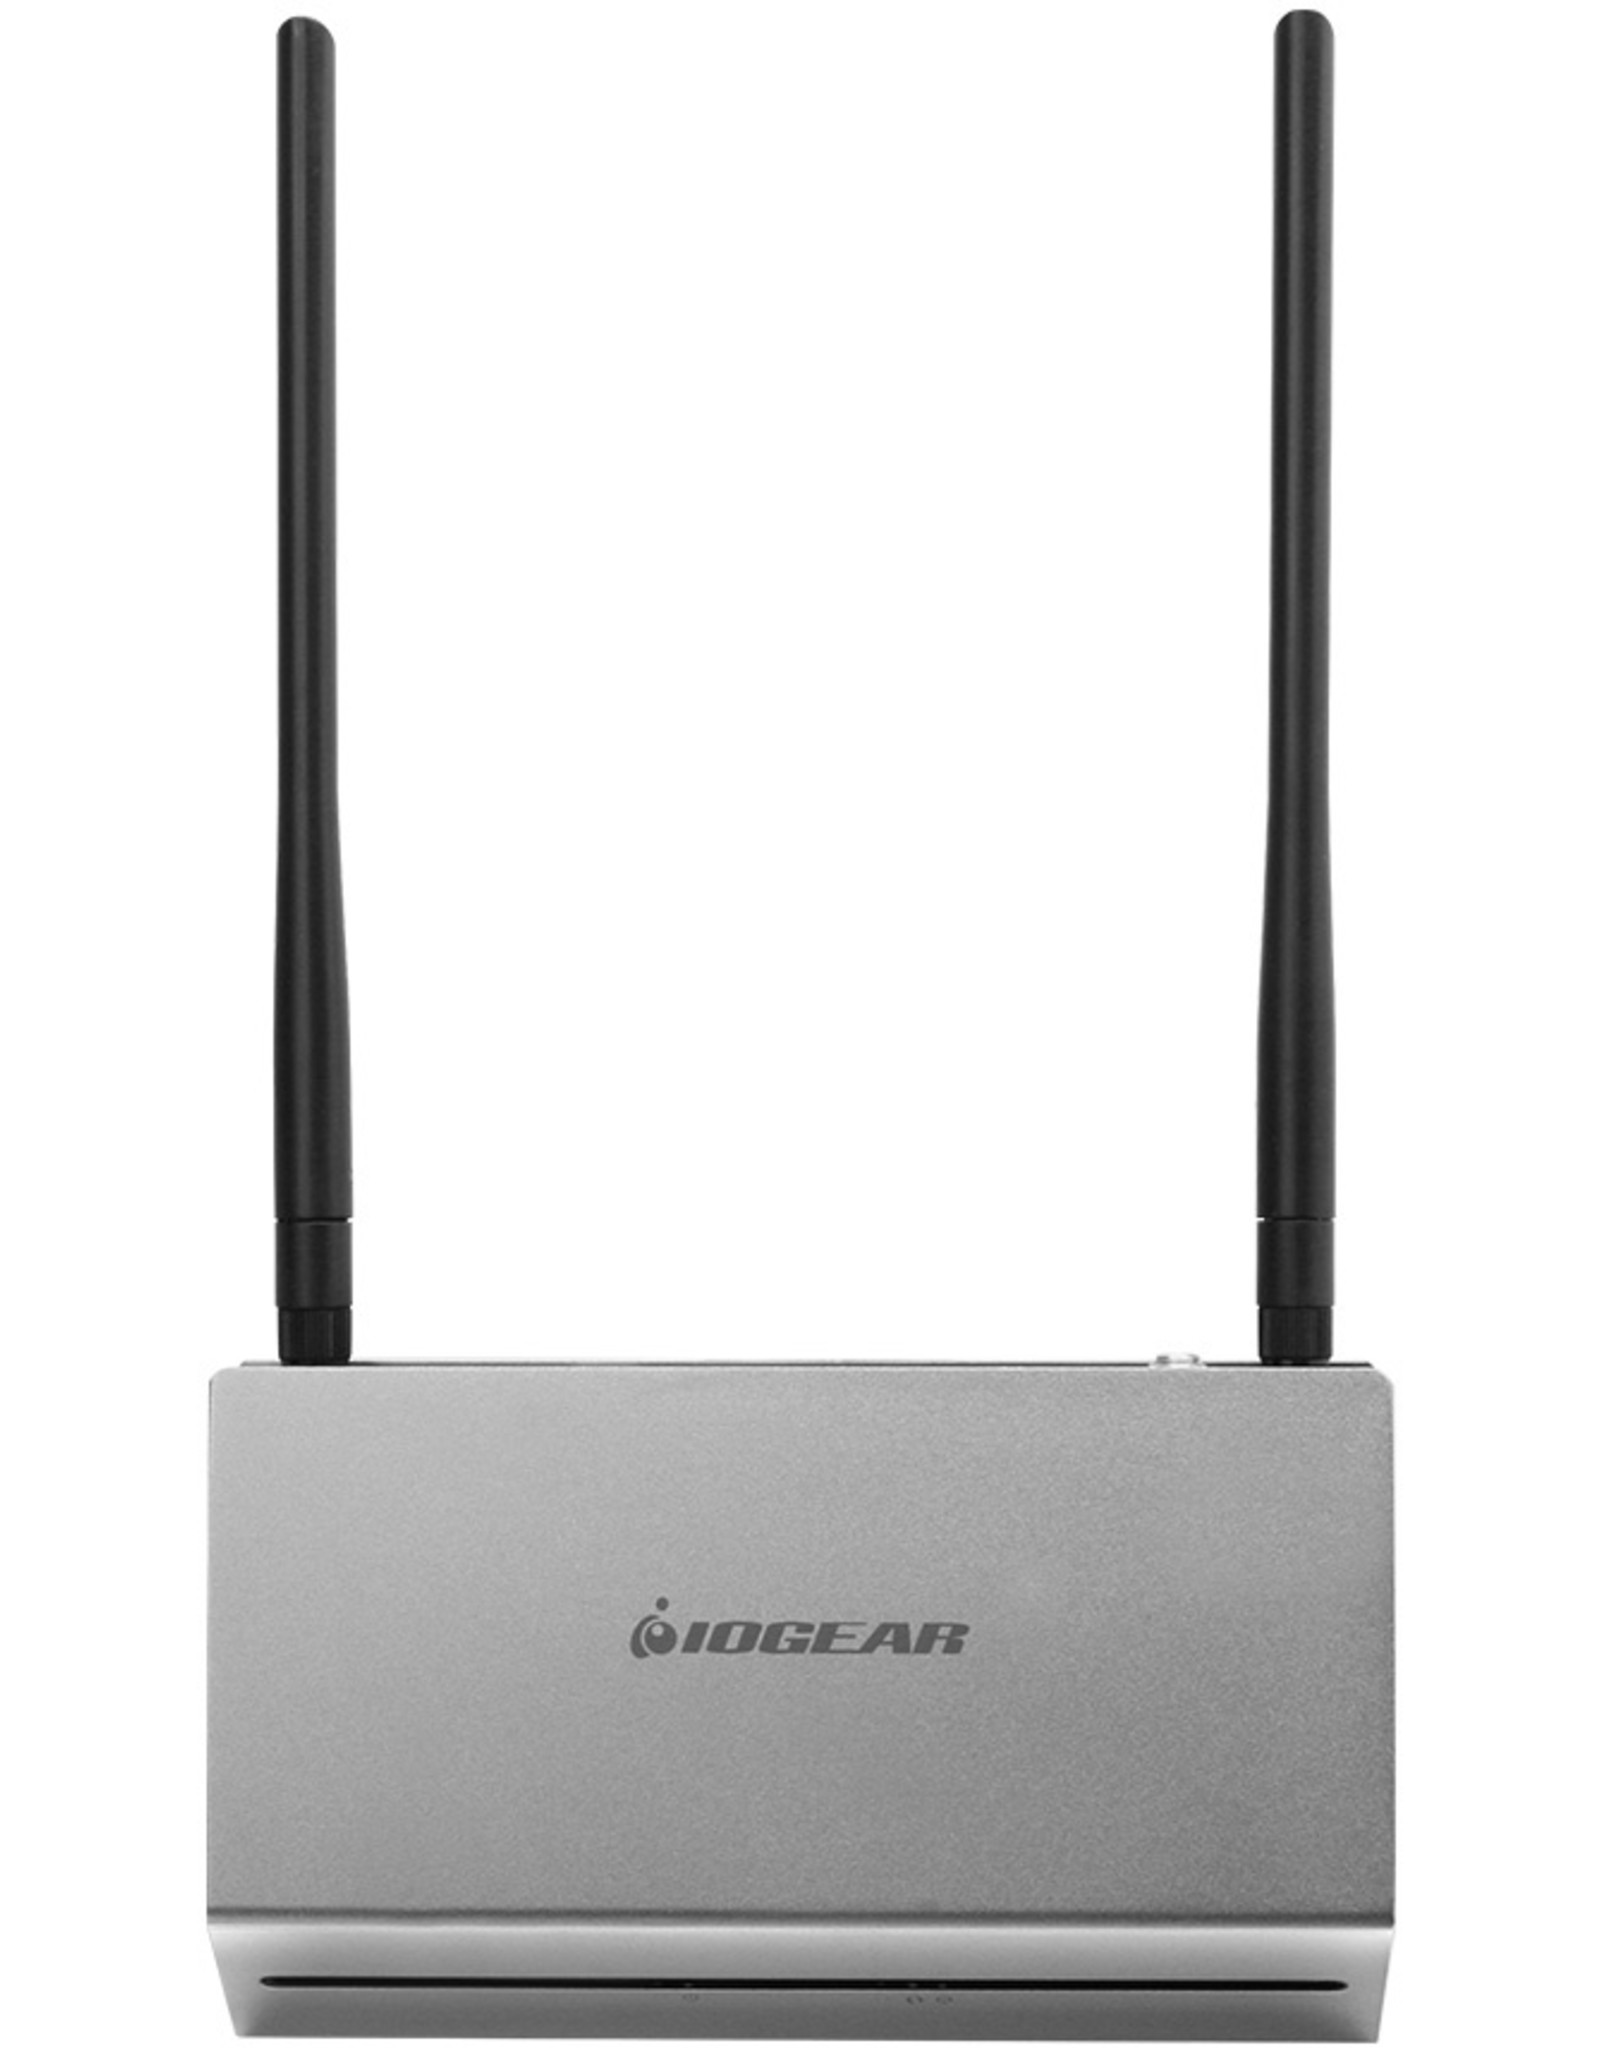 SO IOGEAR ULTRA LONG RANGE WIRELESS HDMI RECEIVER GWLRHDRX